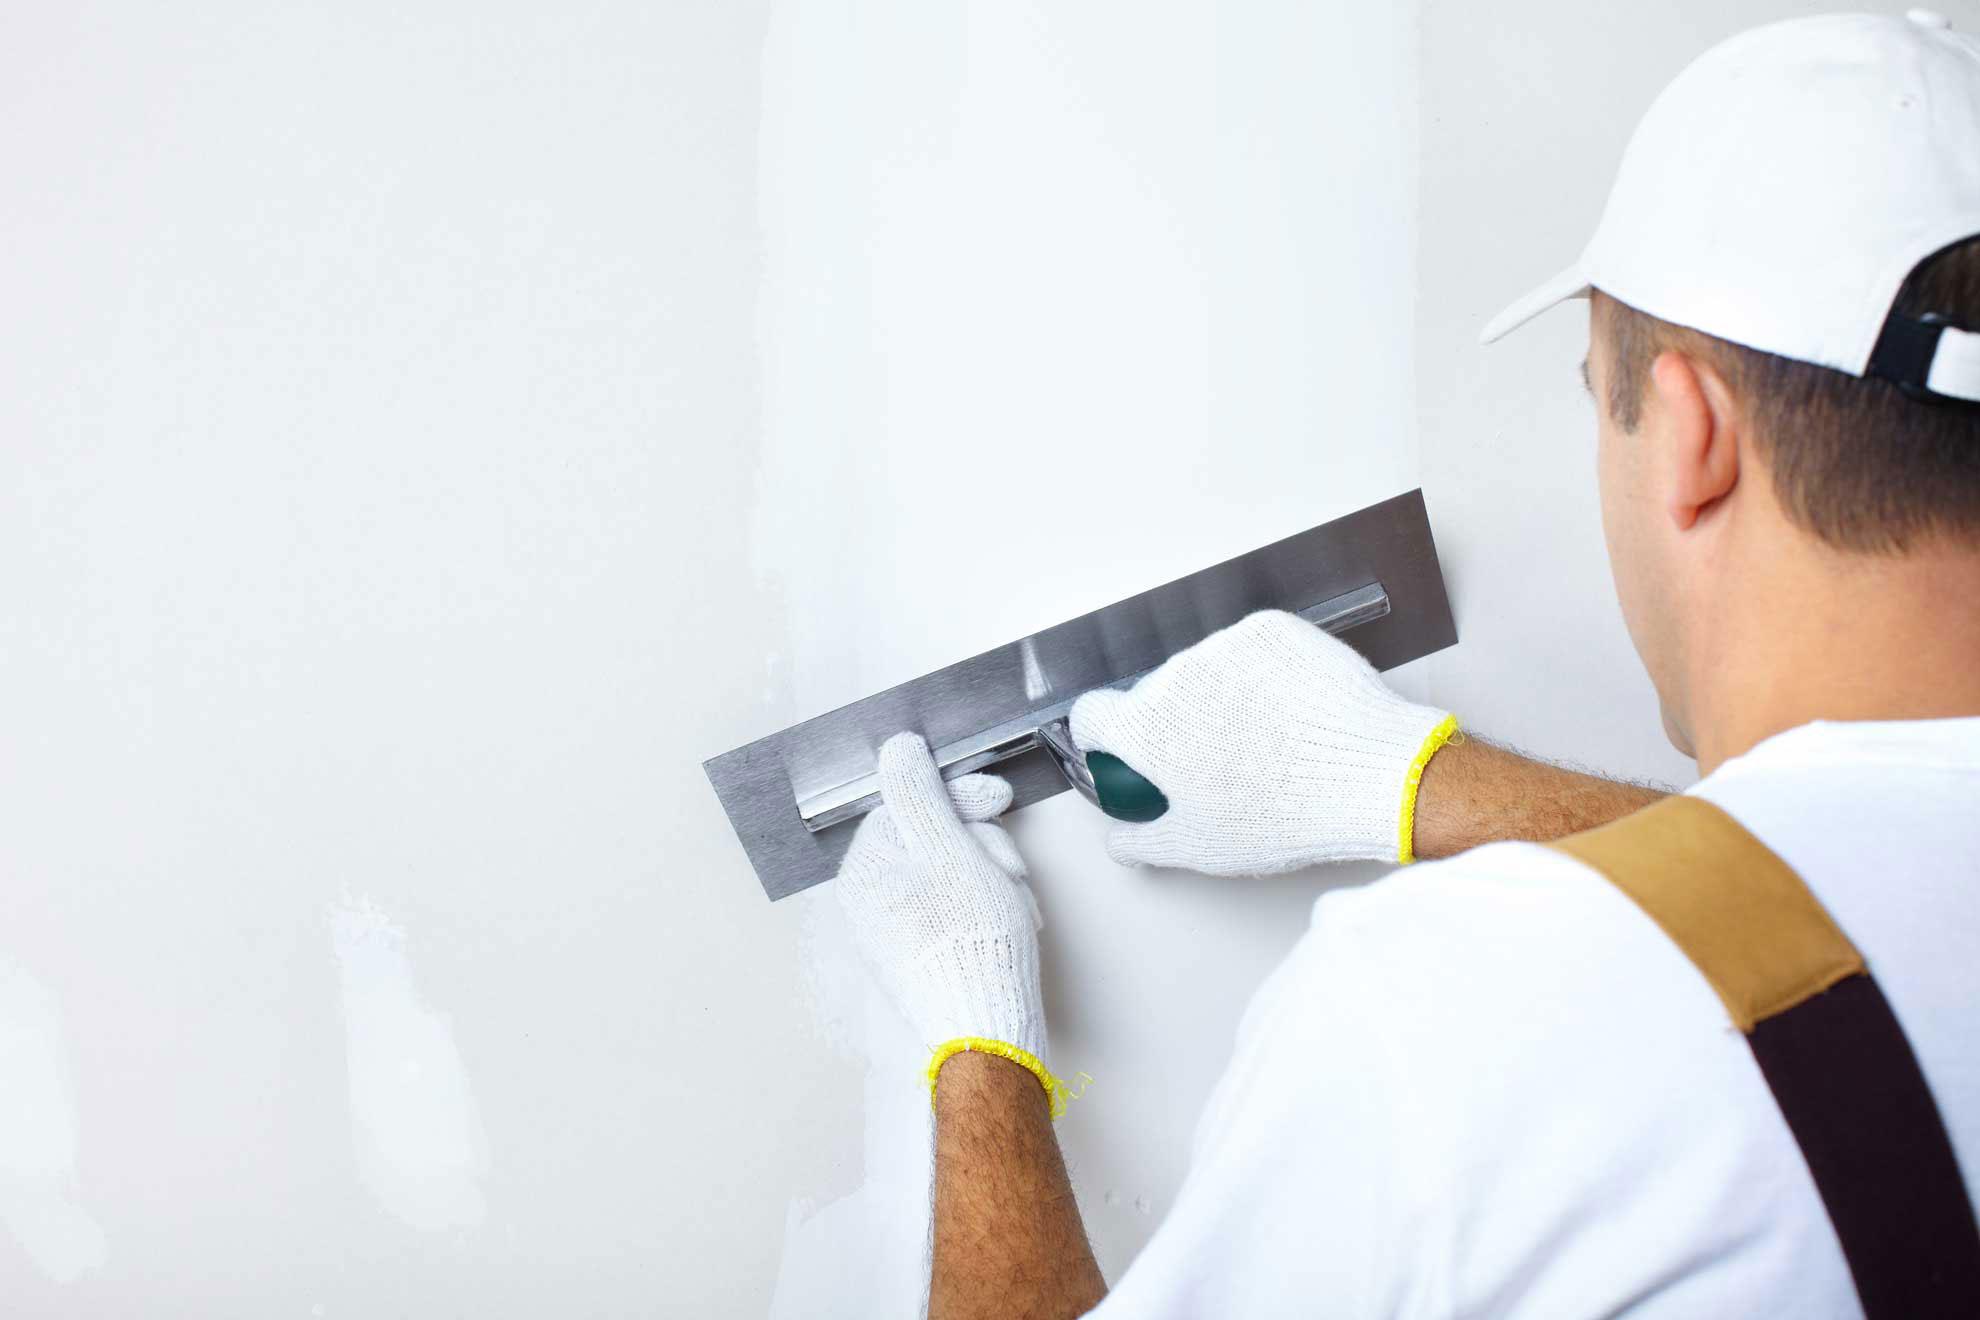 Шпаклевка стен под обои, кирпич, бетон, покраску